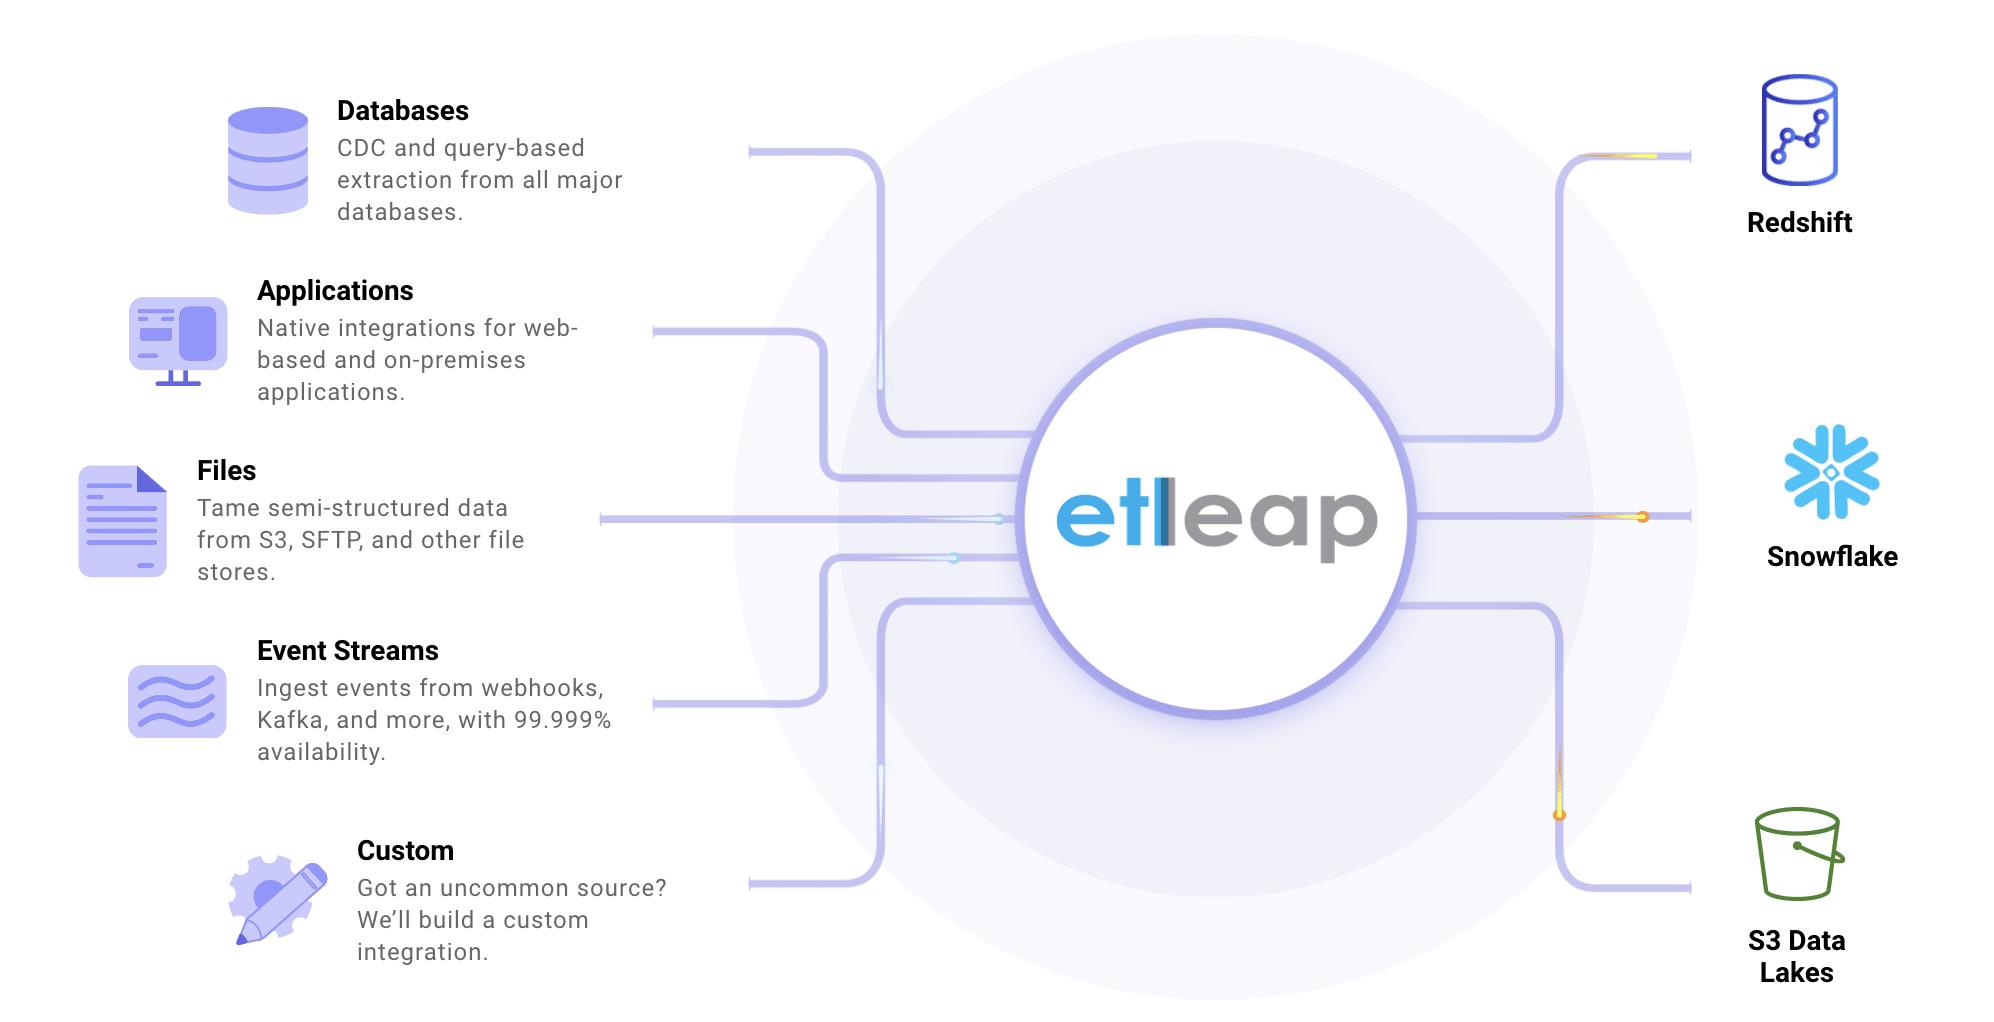 Snowflake ETL Tools: Etleap